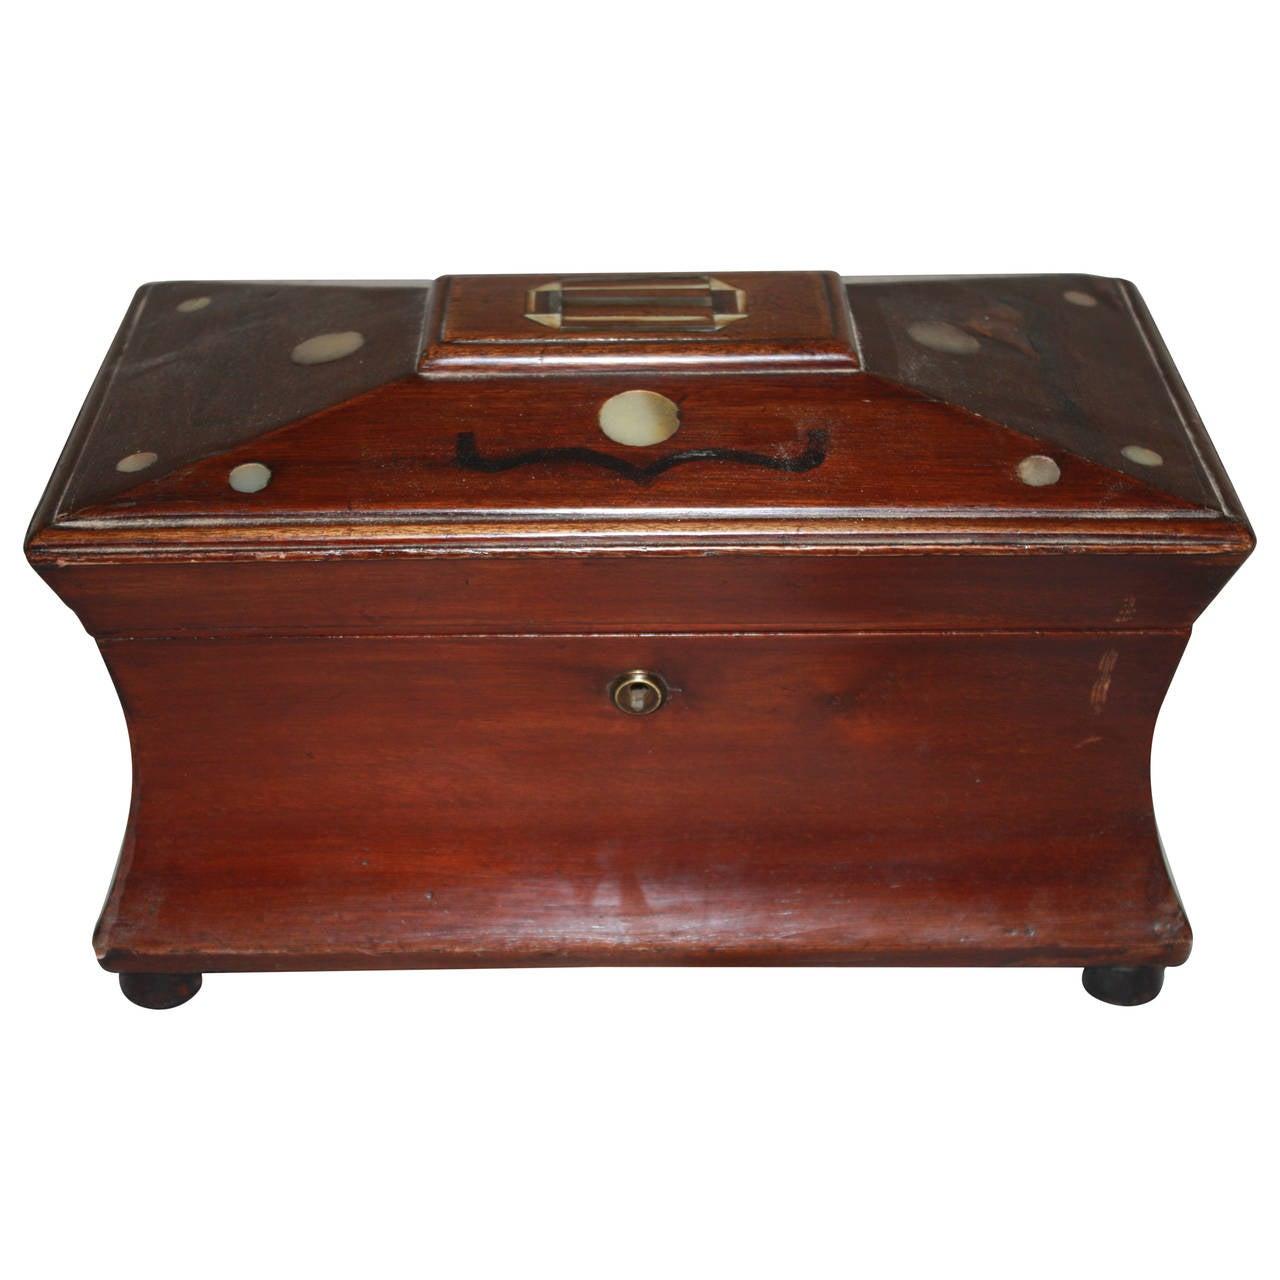 19th Century French Jewelry Box